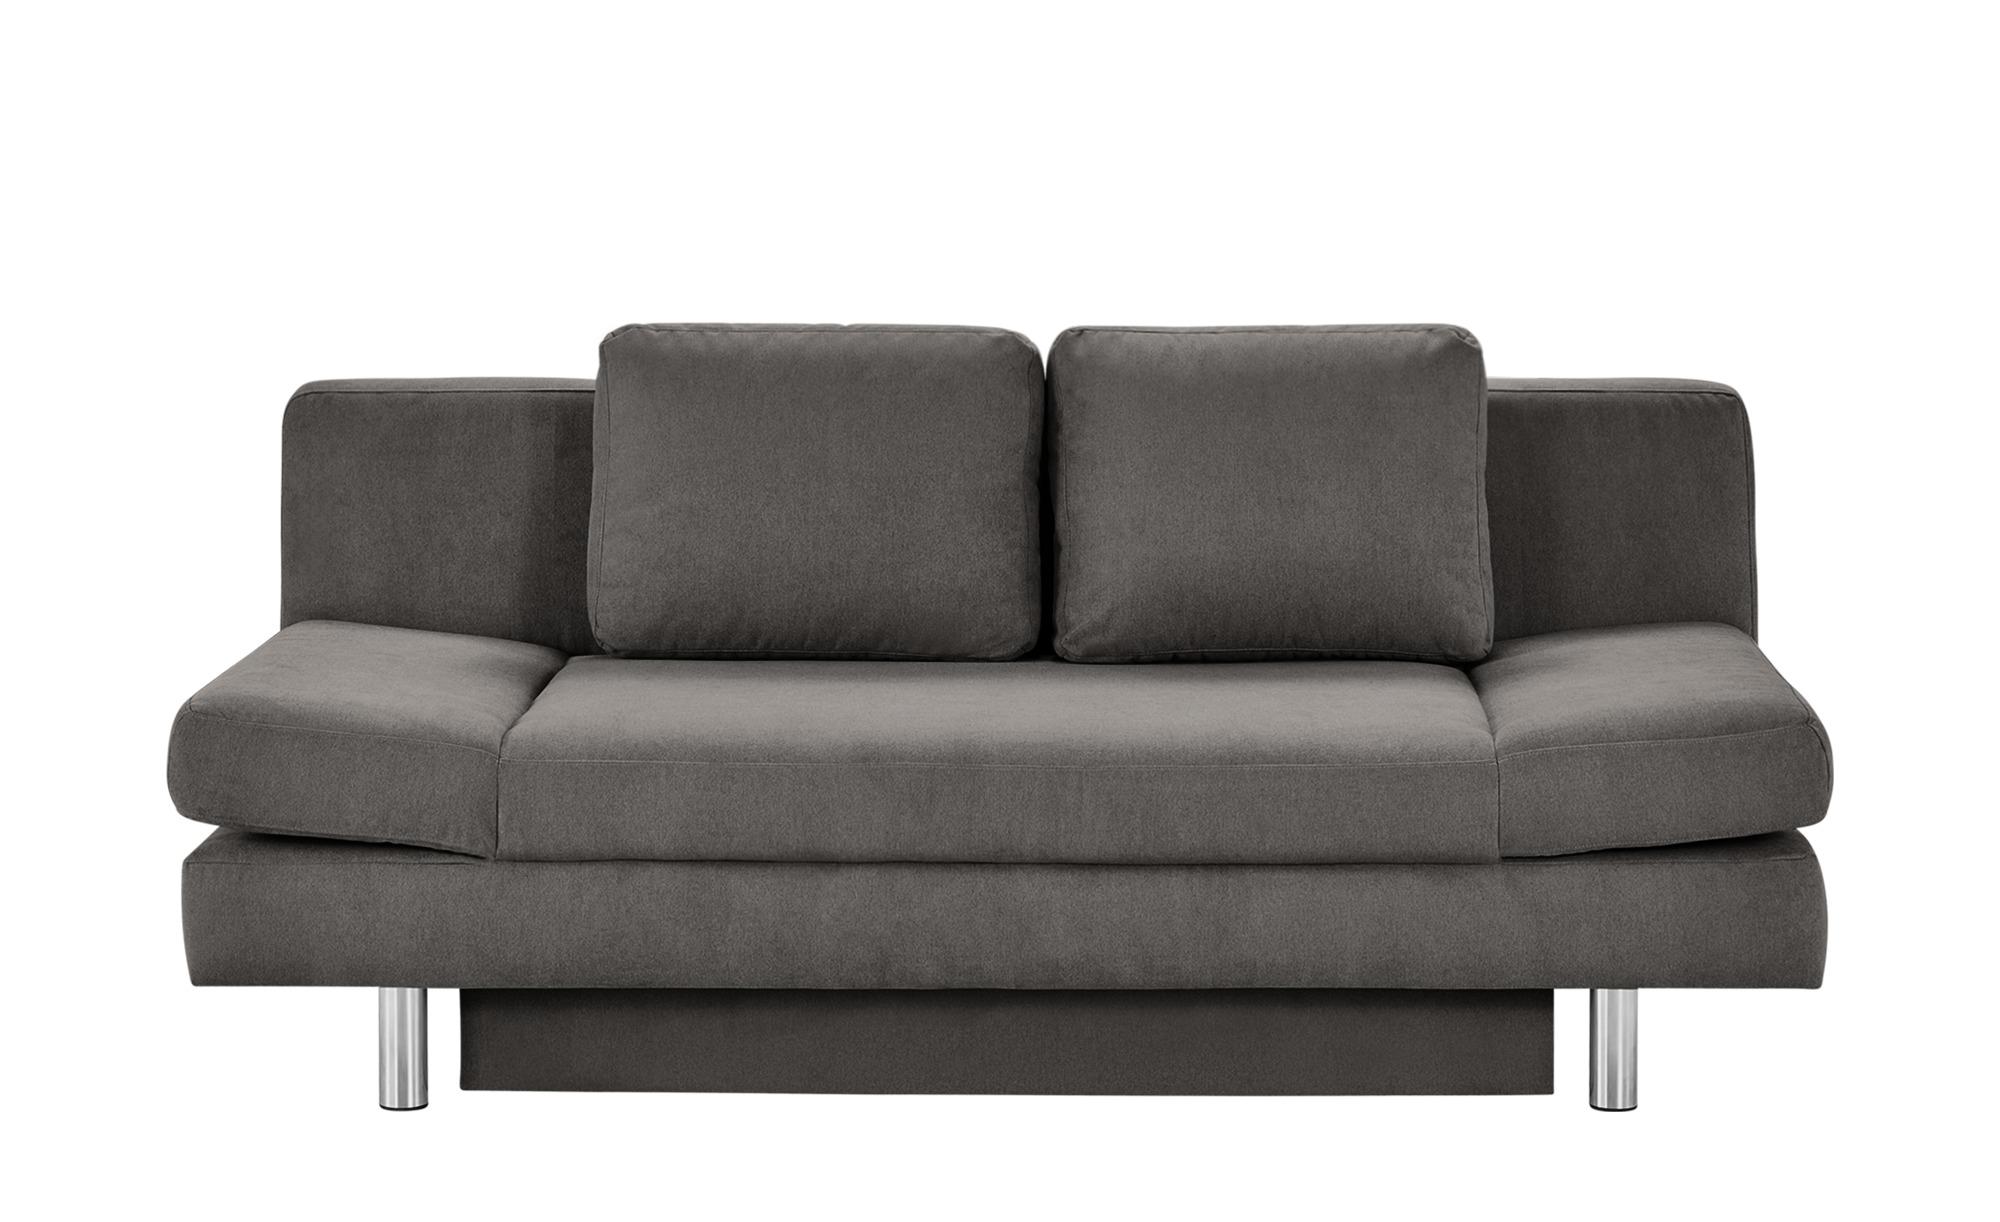 smart Schlafsofa grau - Webstoff Nina ¦ Maße (cm): B: 205 H: 90 T: 95 Polstermöbel > Sofas > 2-Sitzer - Höffner